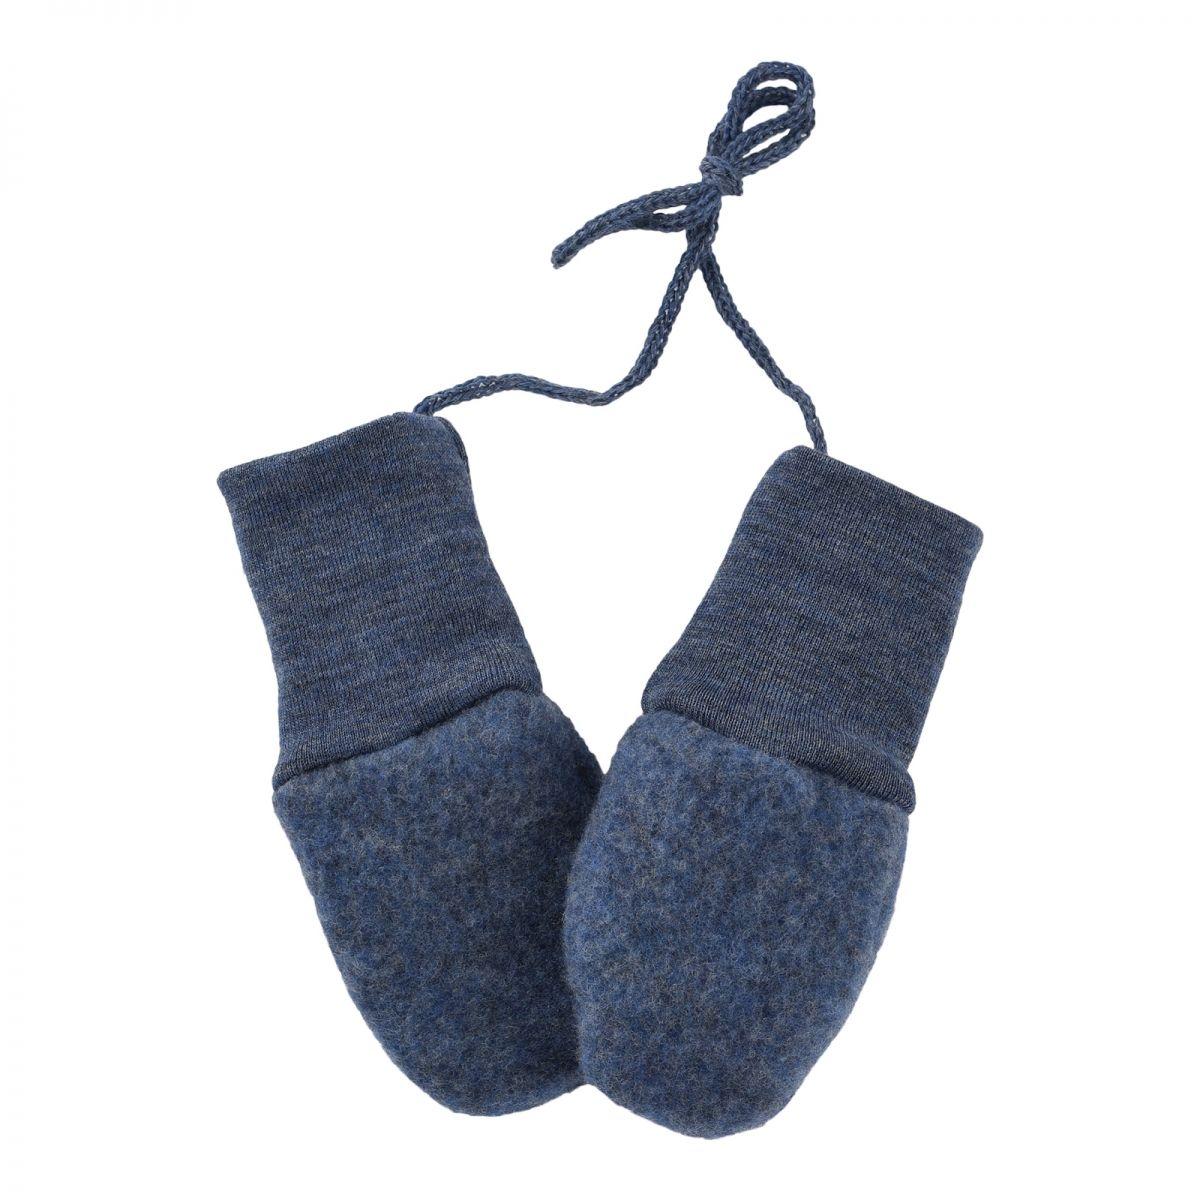 ENGEL Baby-mittens blue melange